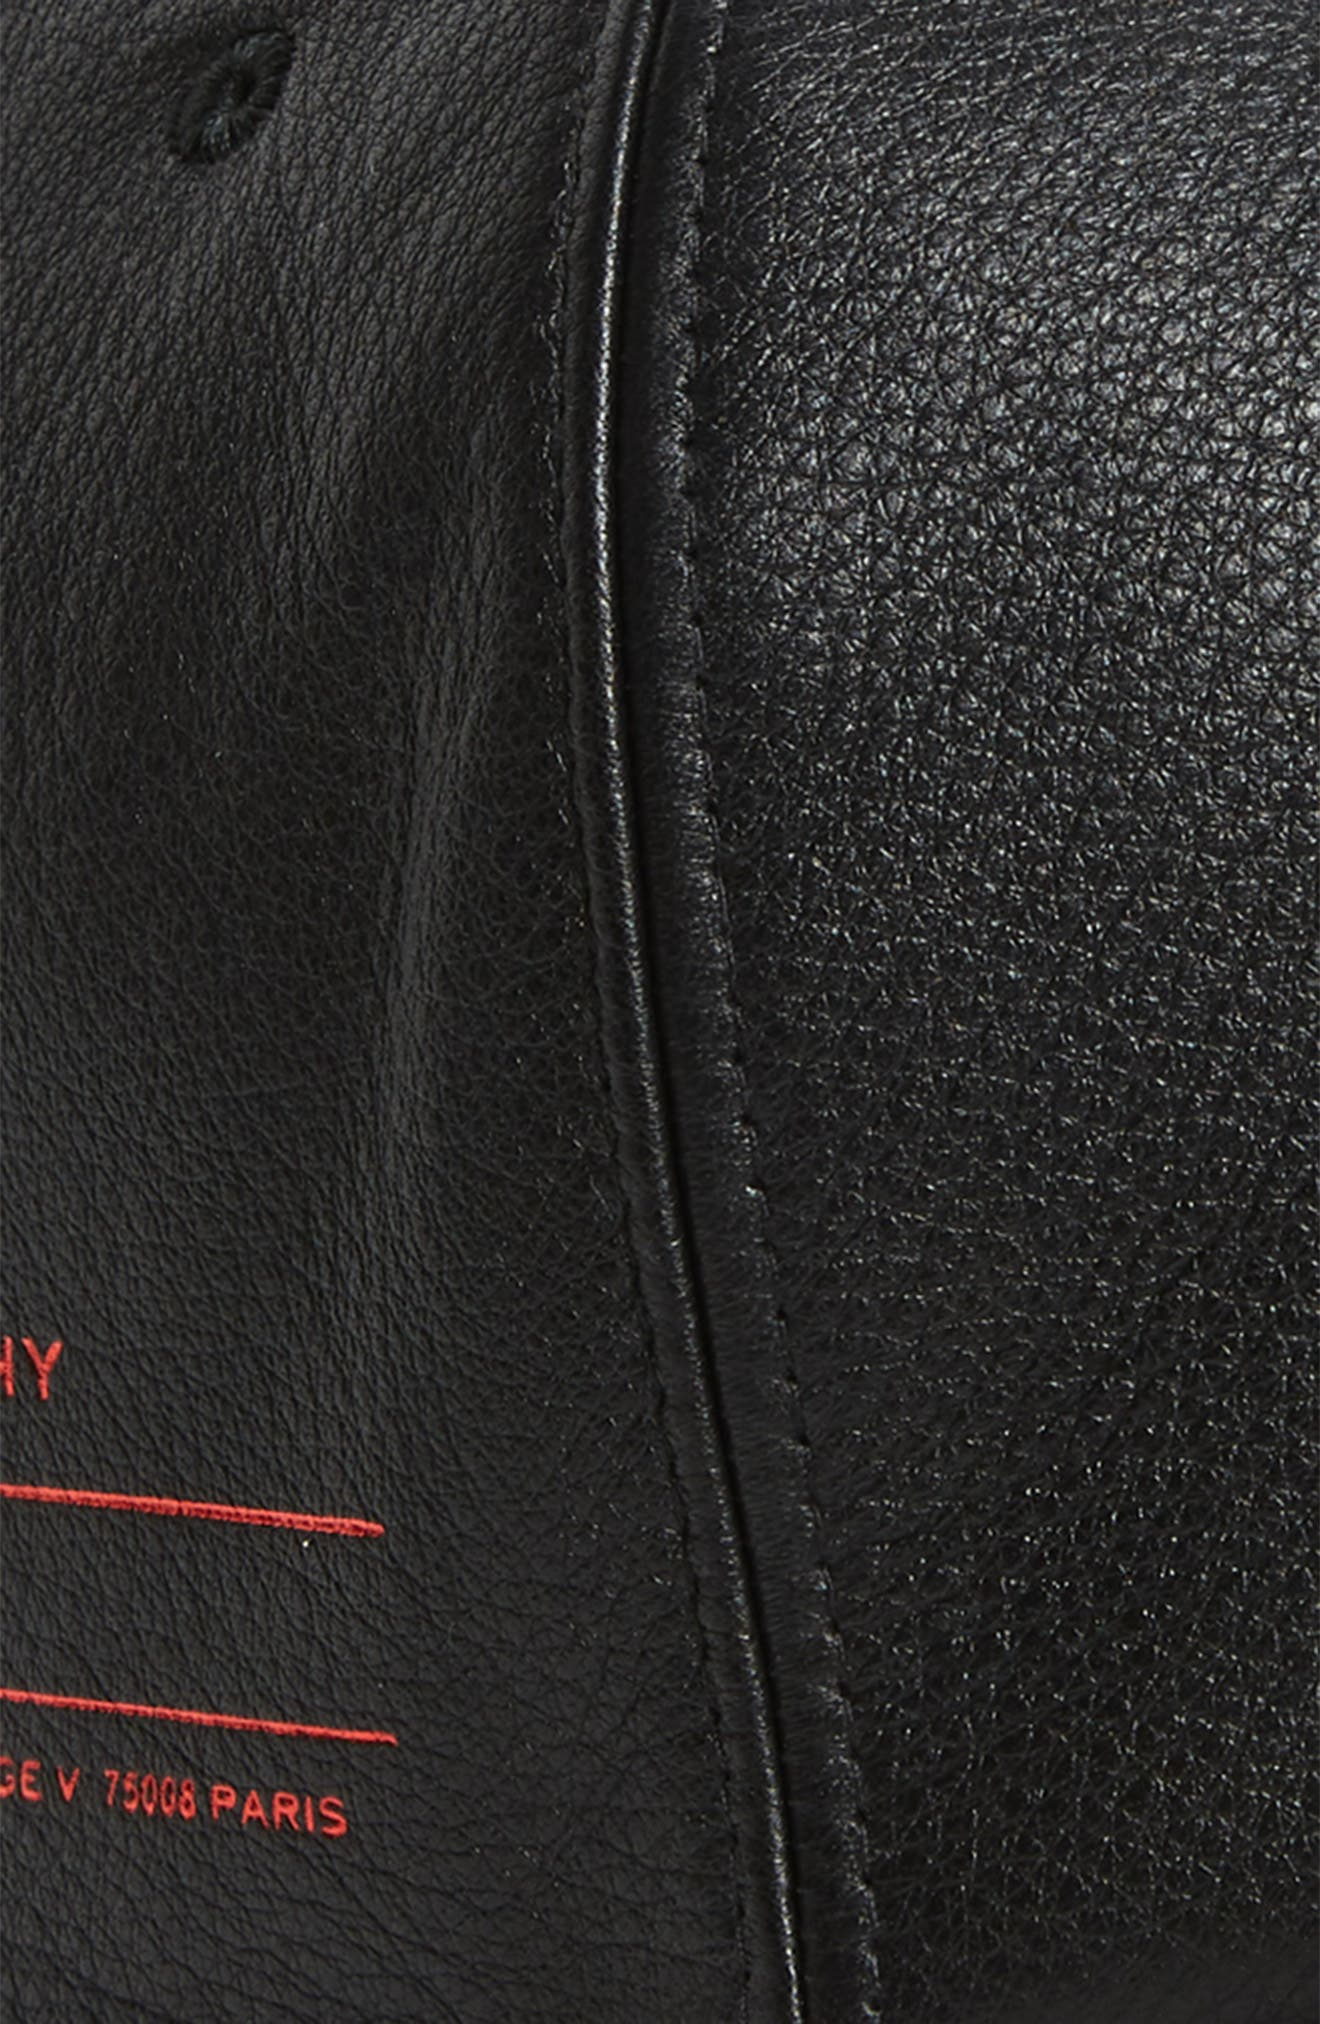 Leather Ball Cap,                             Alternate thumbnail 3, color,                             005